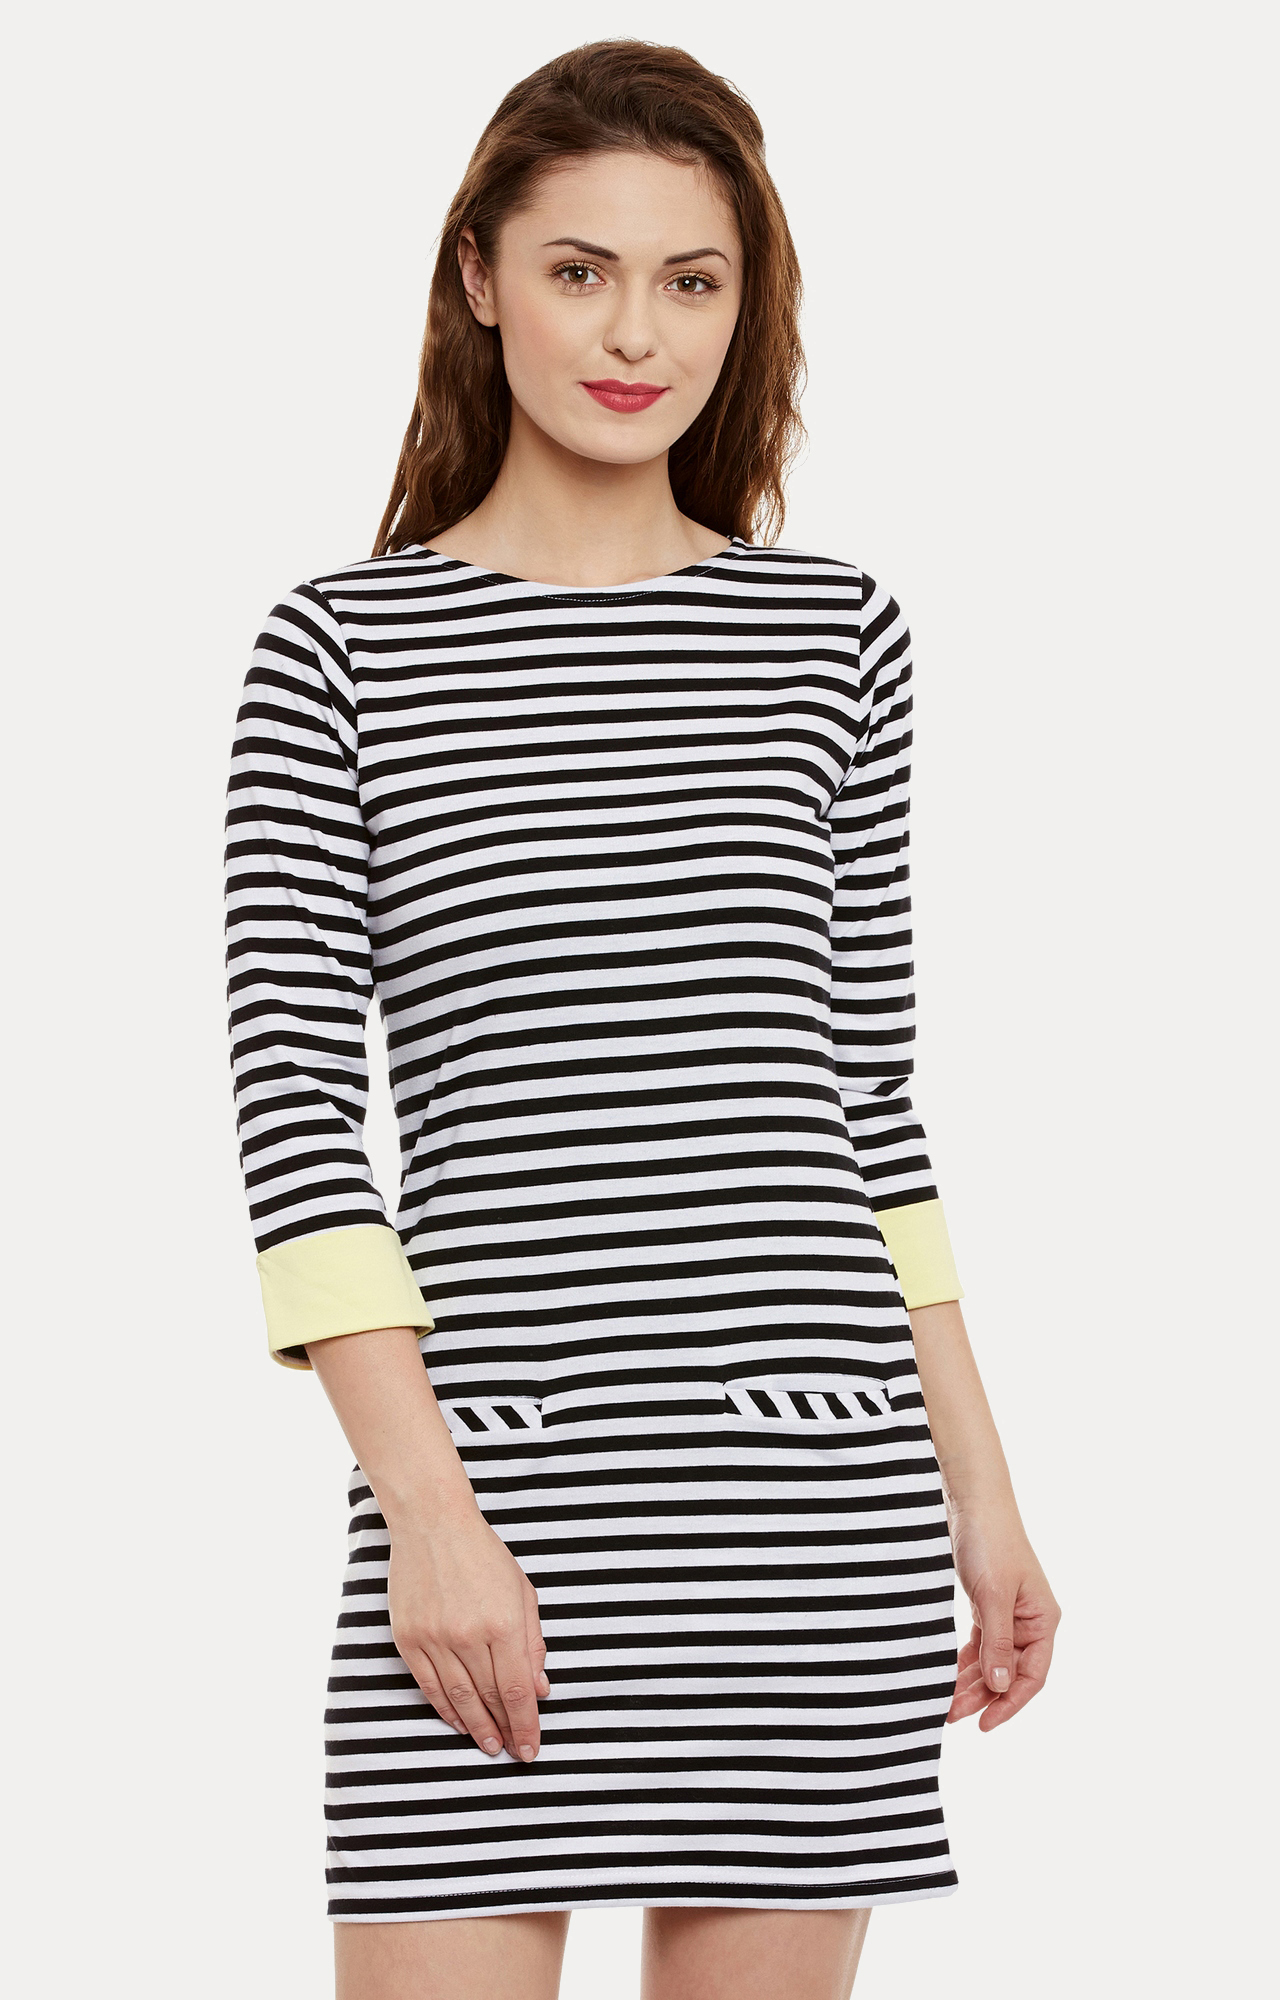 Black and White Striped Shift Dress